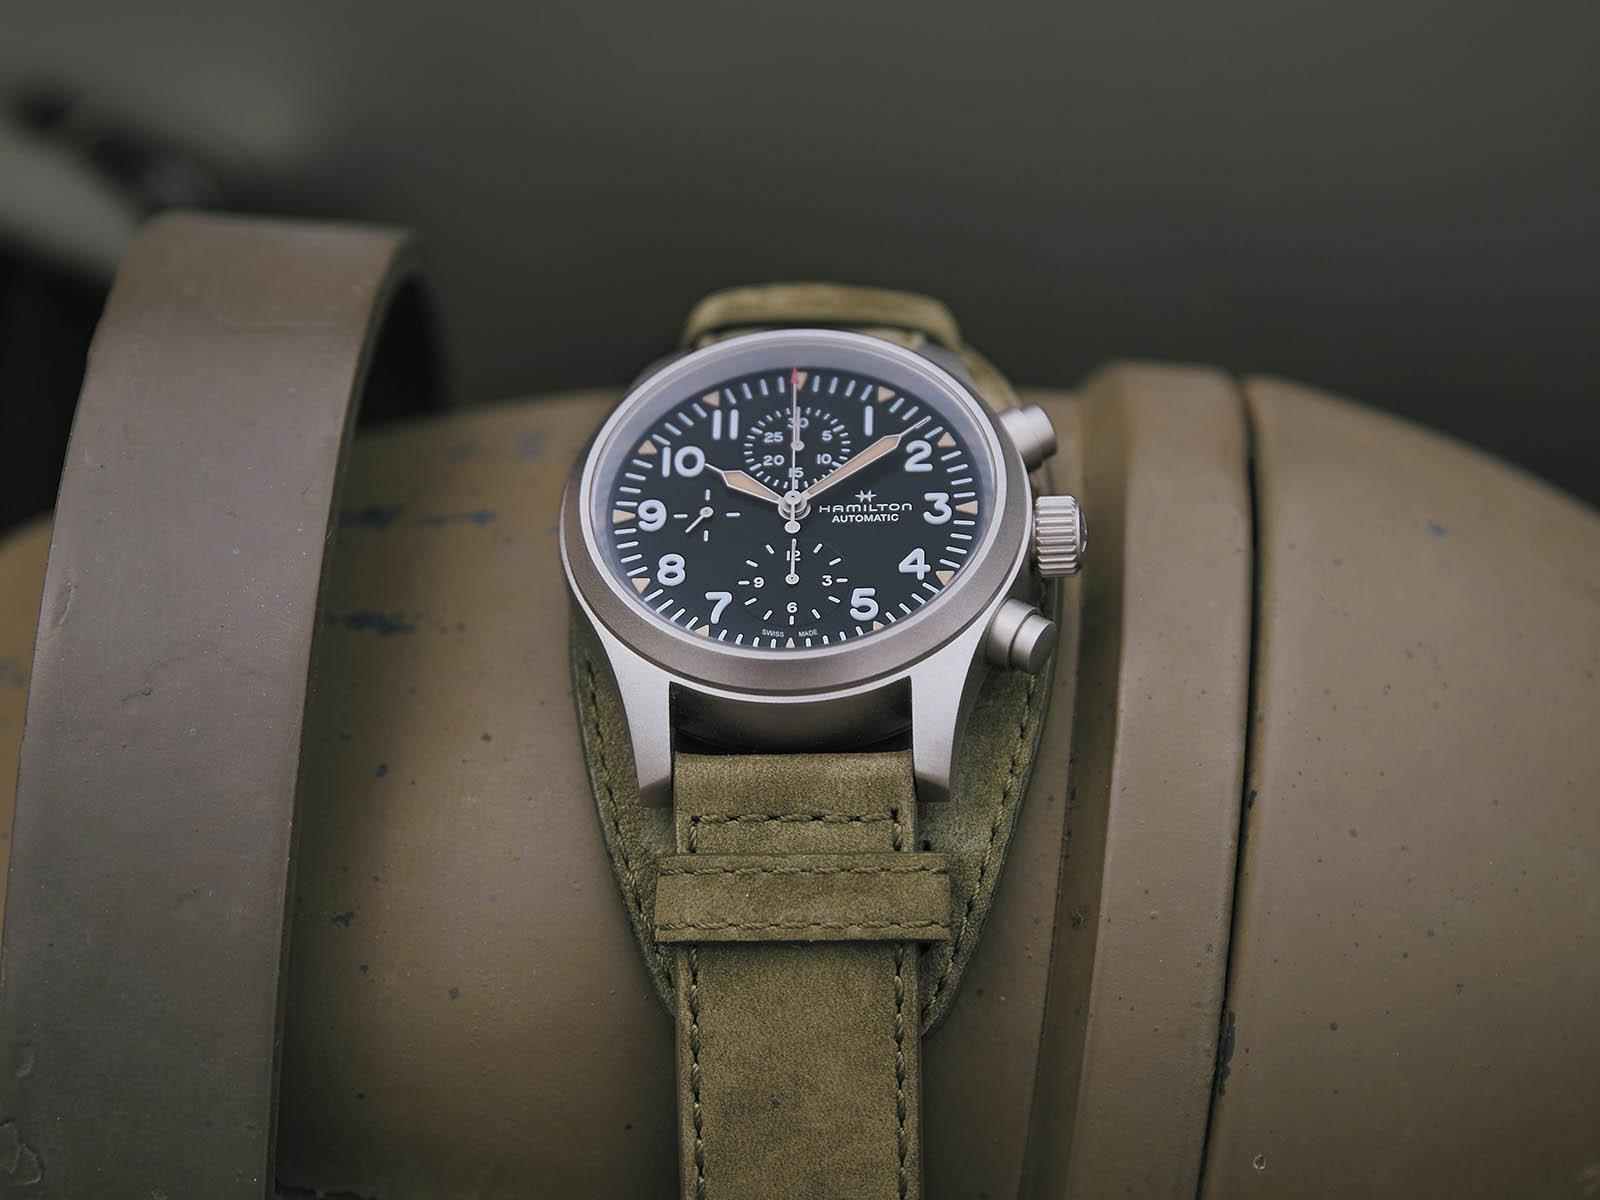 h71706830-hamilton-khaki-field-automatic-chronograph-7.jpg